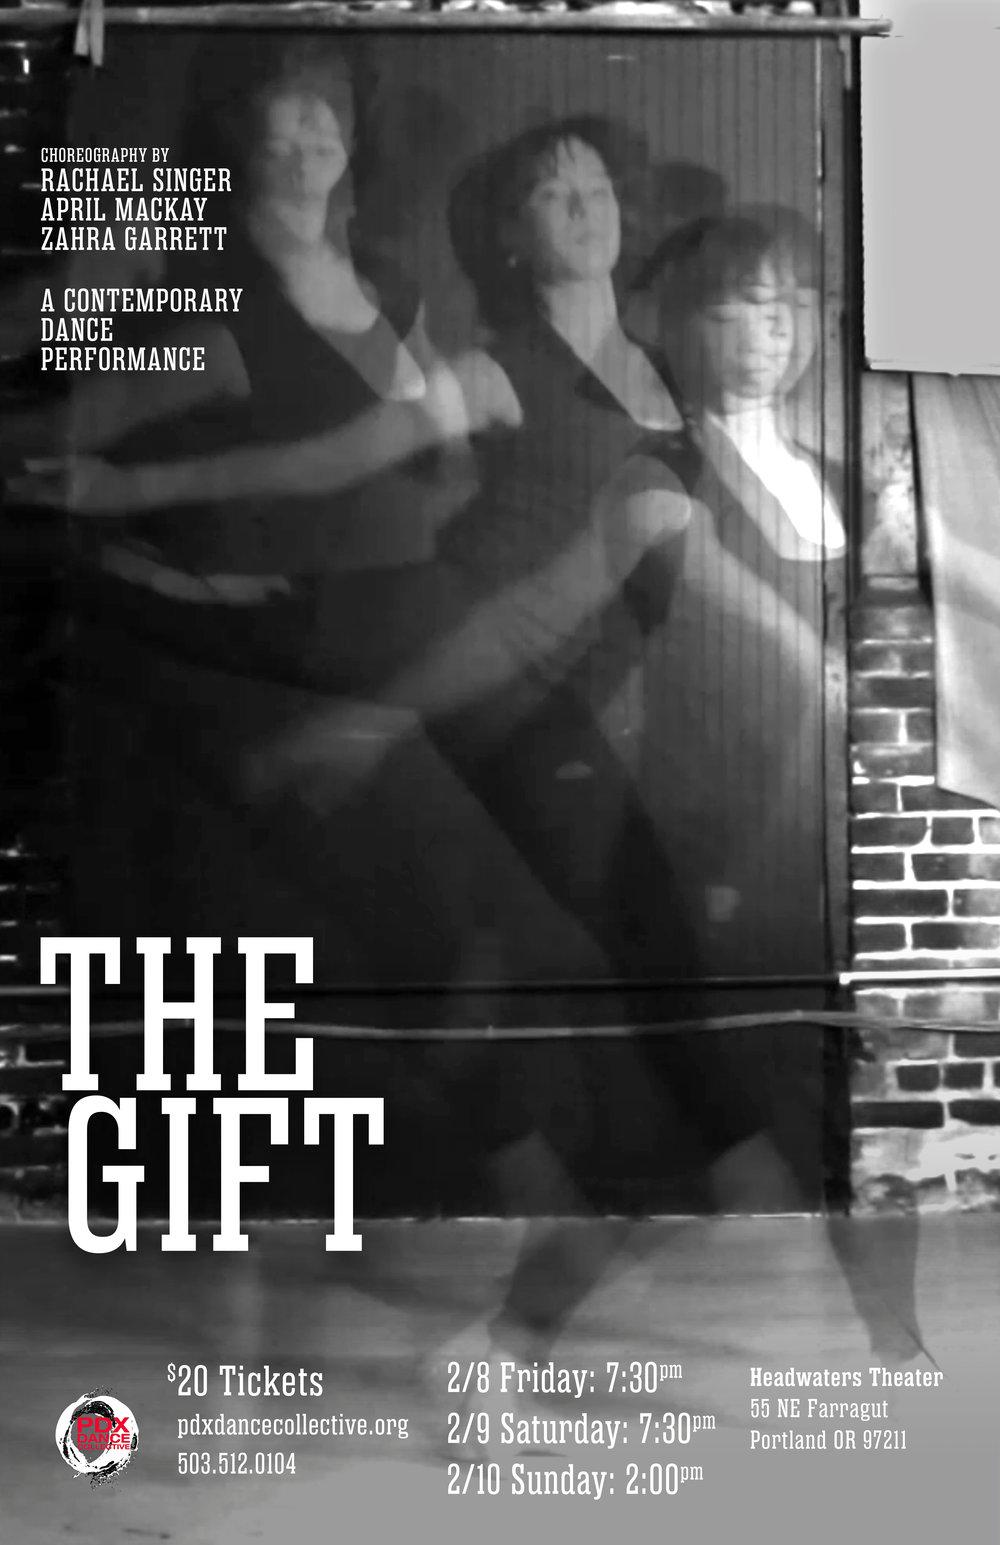 the-gift-poster_11x17.jpg